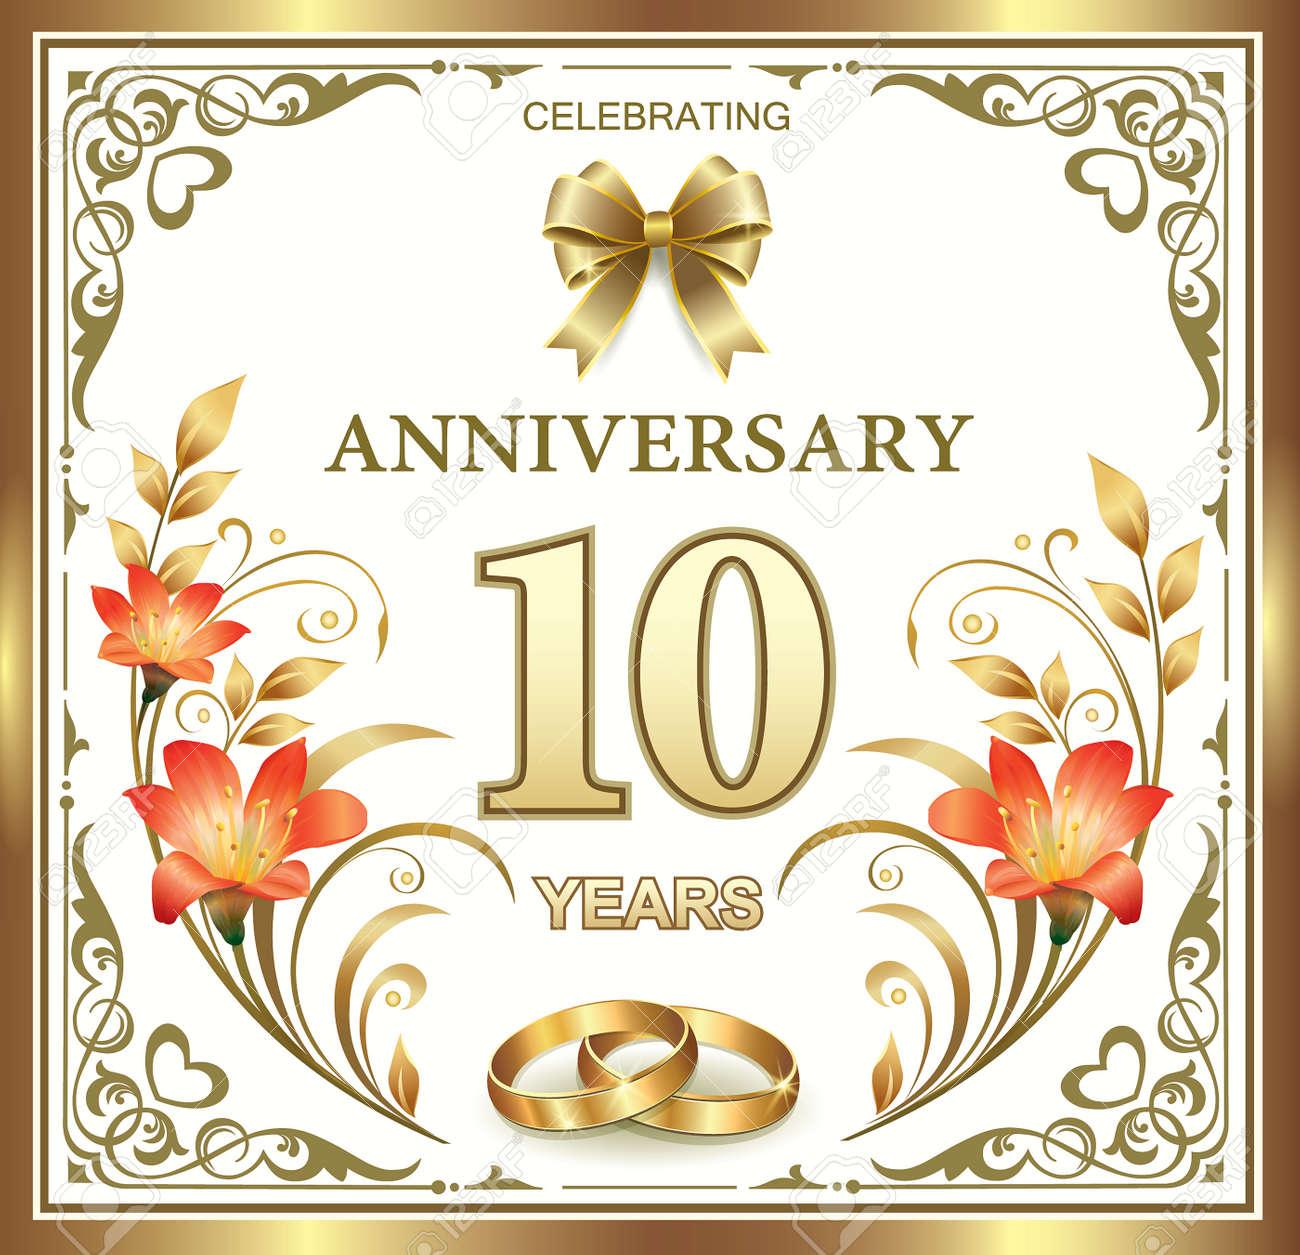 10 Year Wedding Anniversary.10 Year Wedding Anniversary